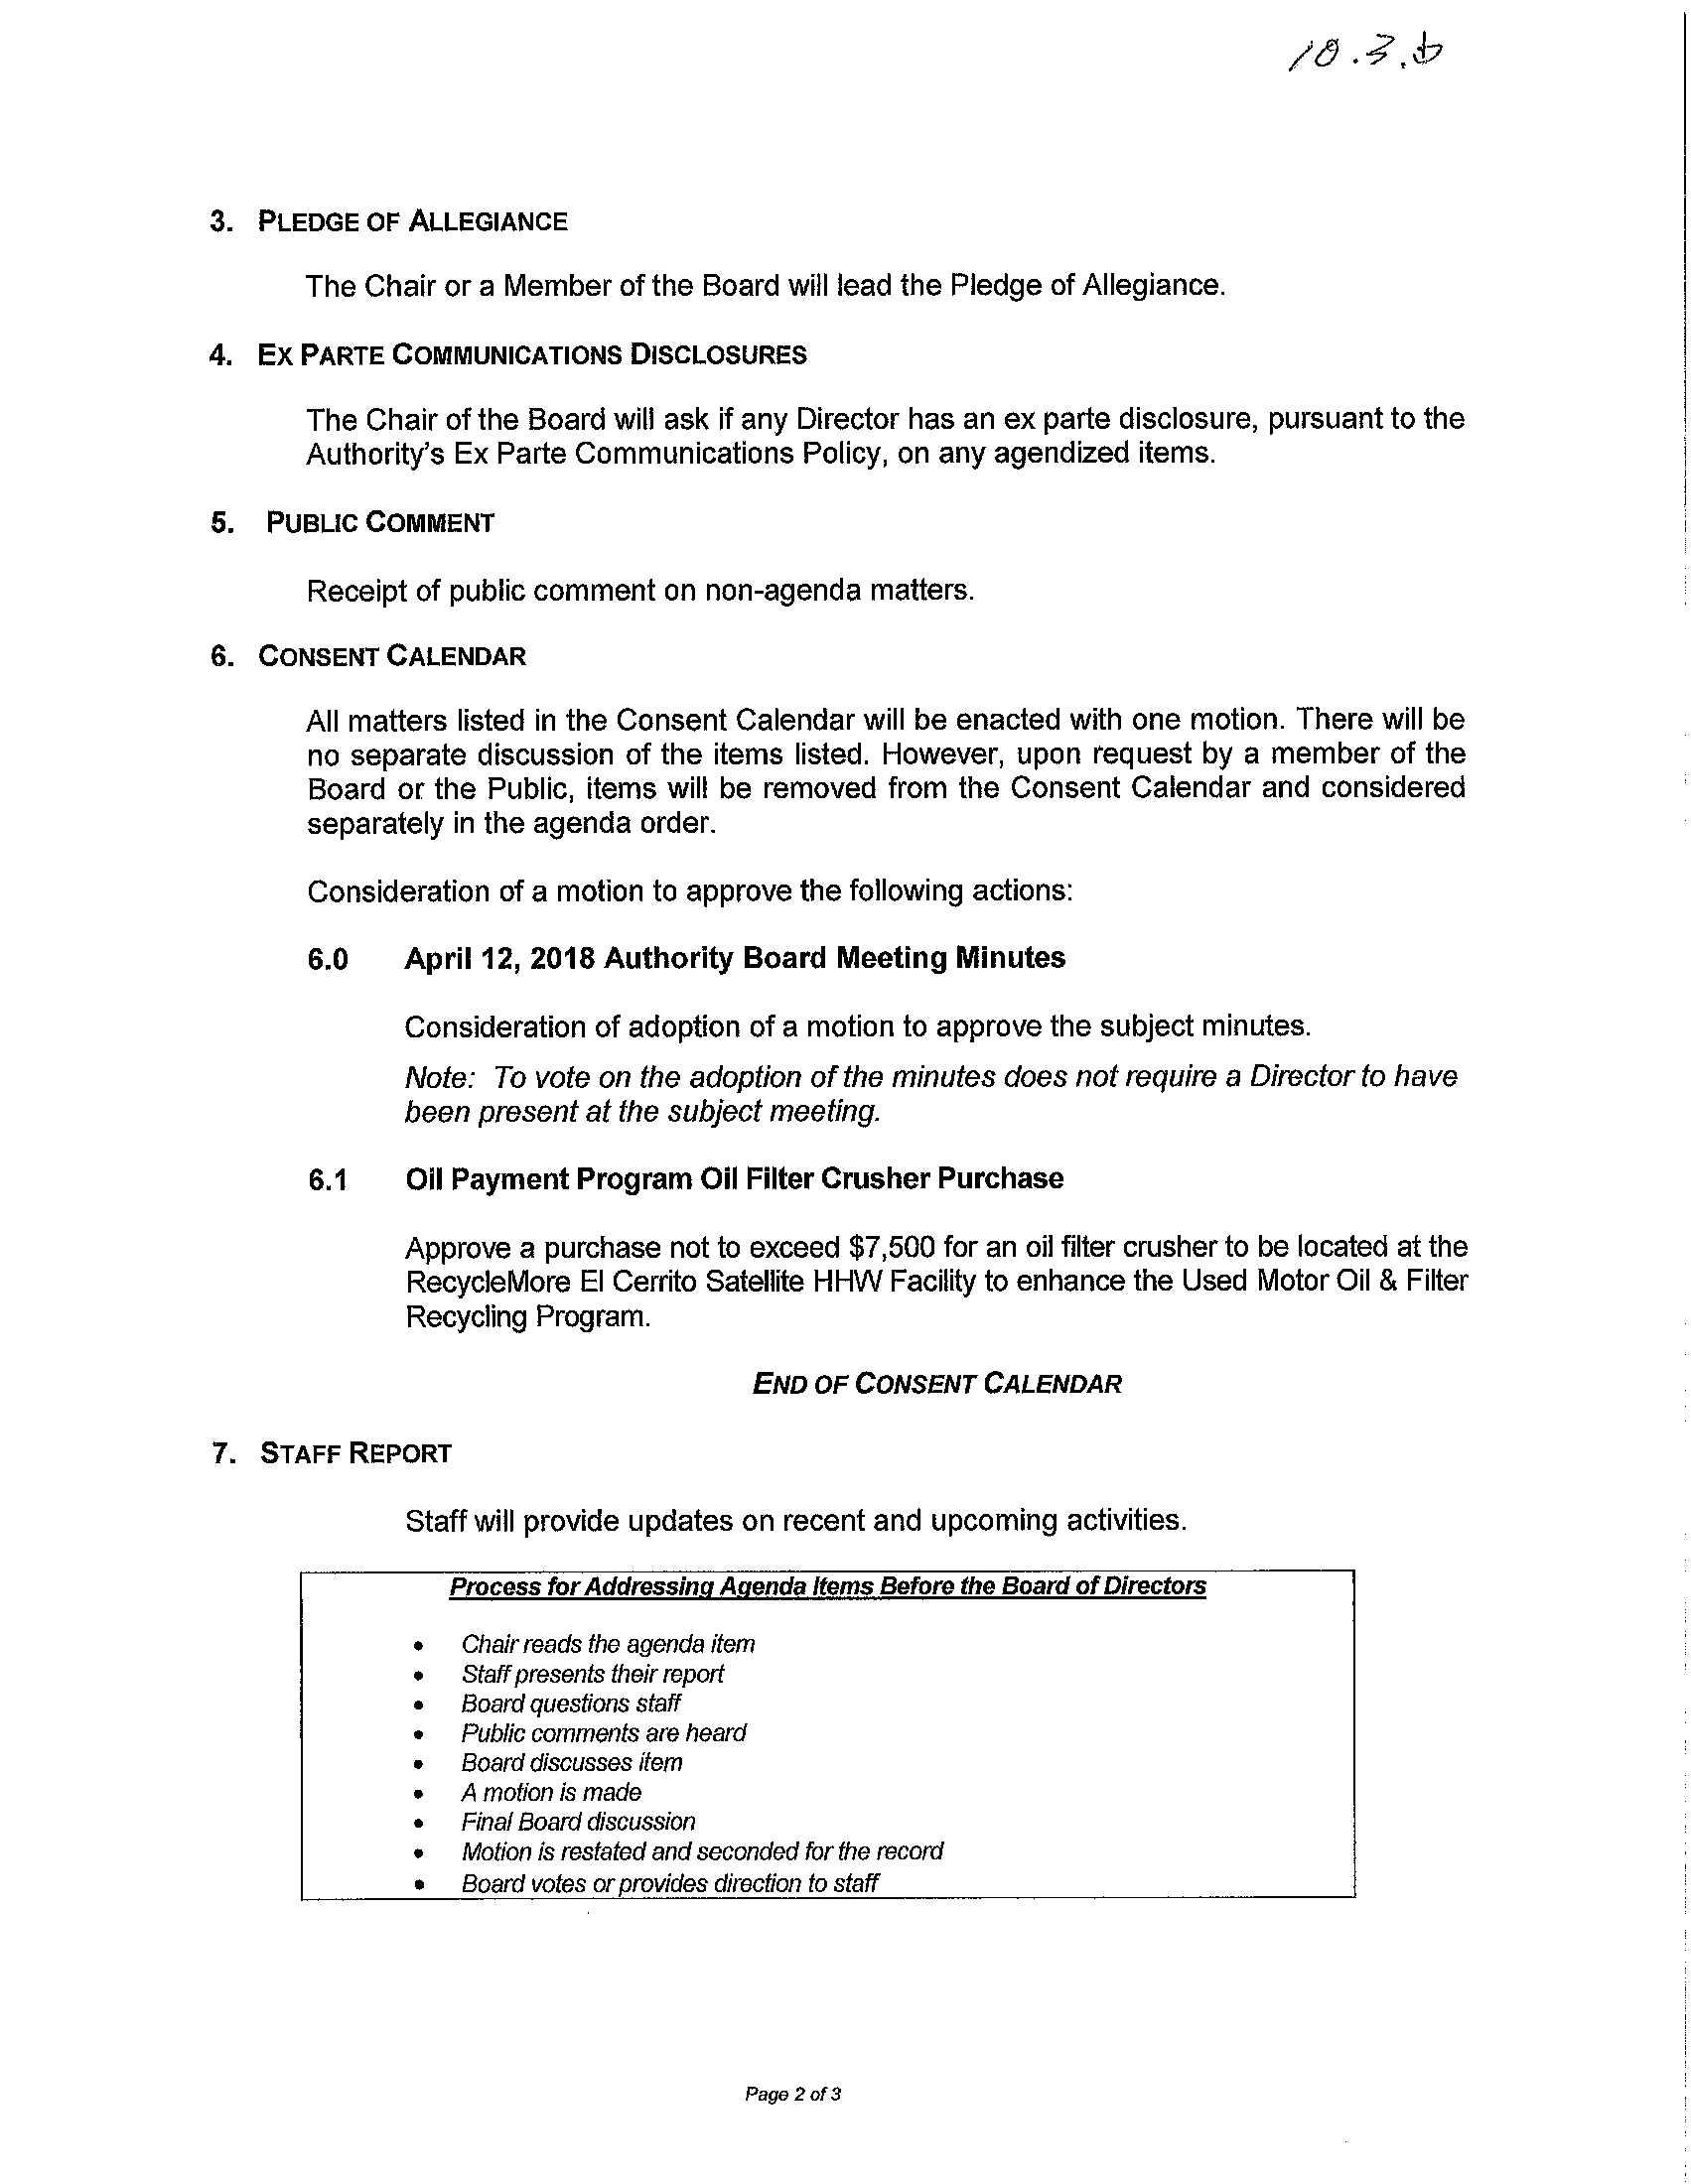 ESMAC Agenda 6.13.2018 (30 Pages)_17.jpg